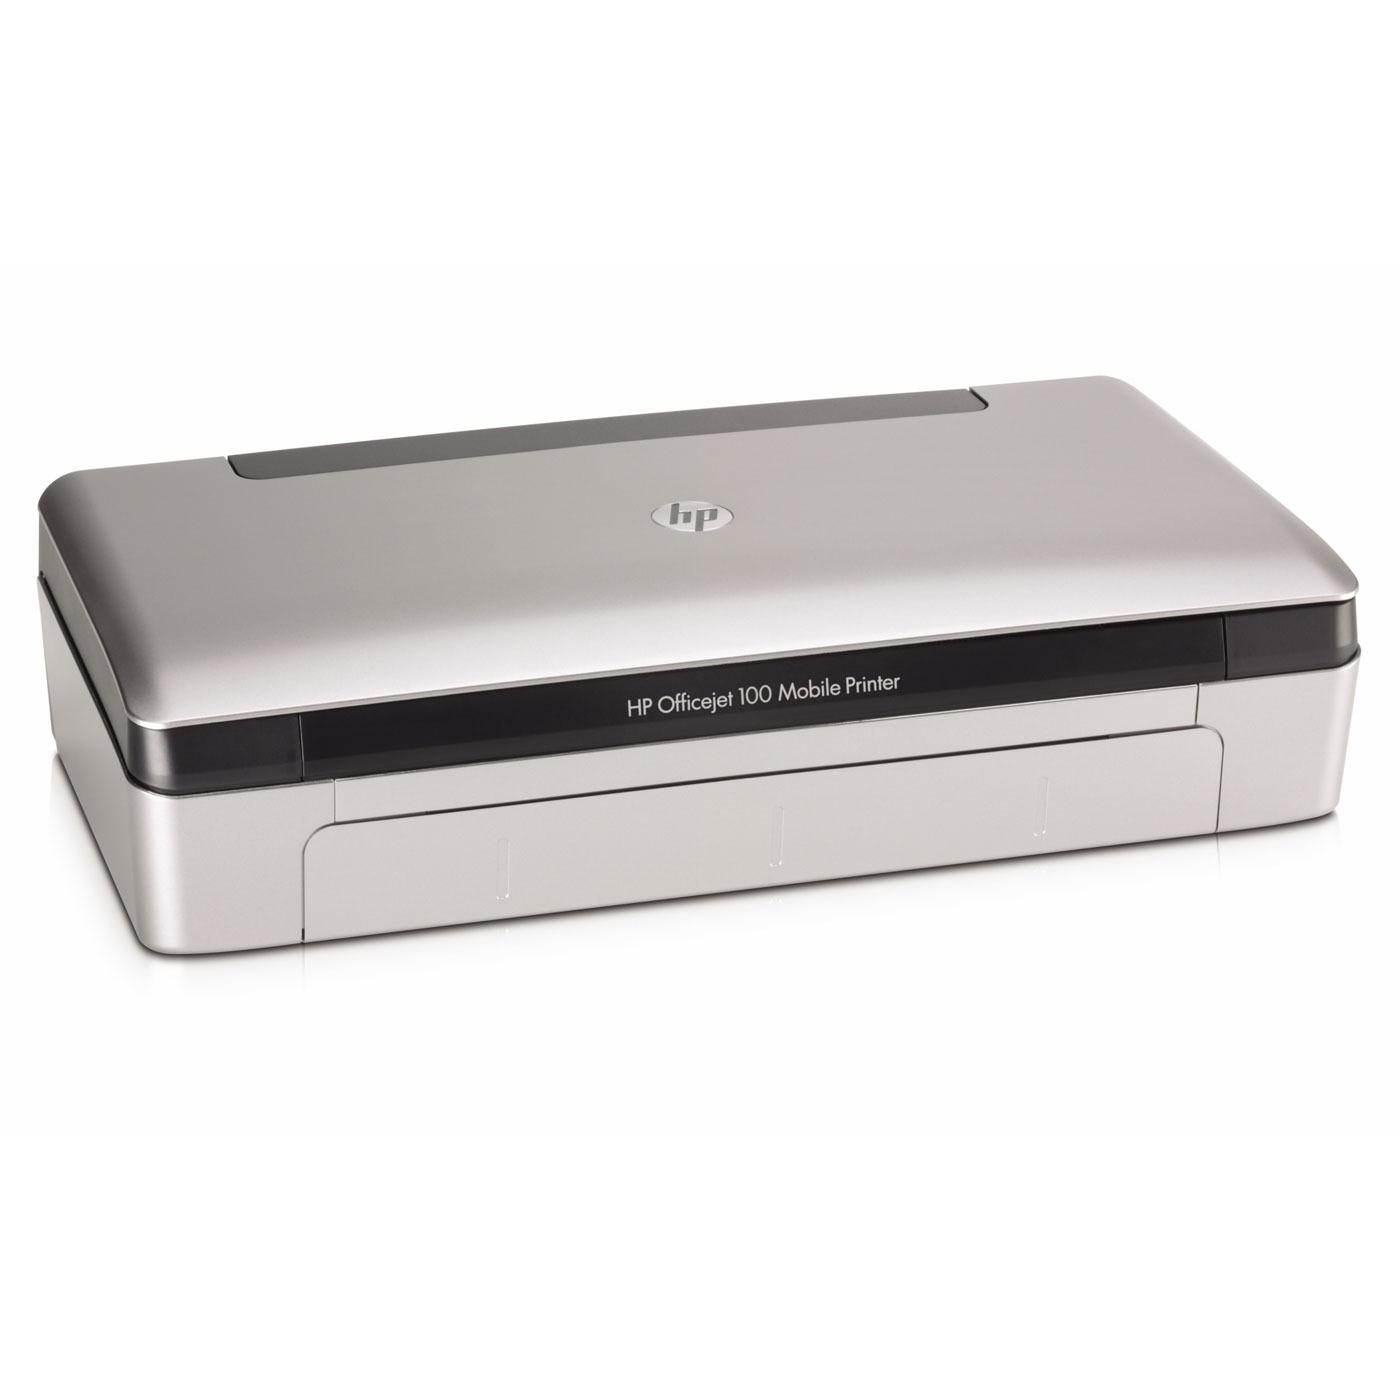 hp officejet 100 l411a imprimante jet d 39 encre hp sur. Black Bedroom Furniture Sets. Home Design Ideas